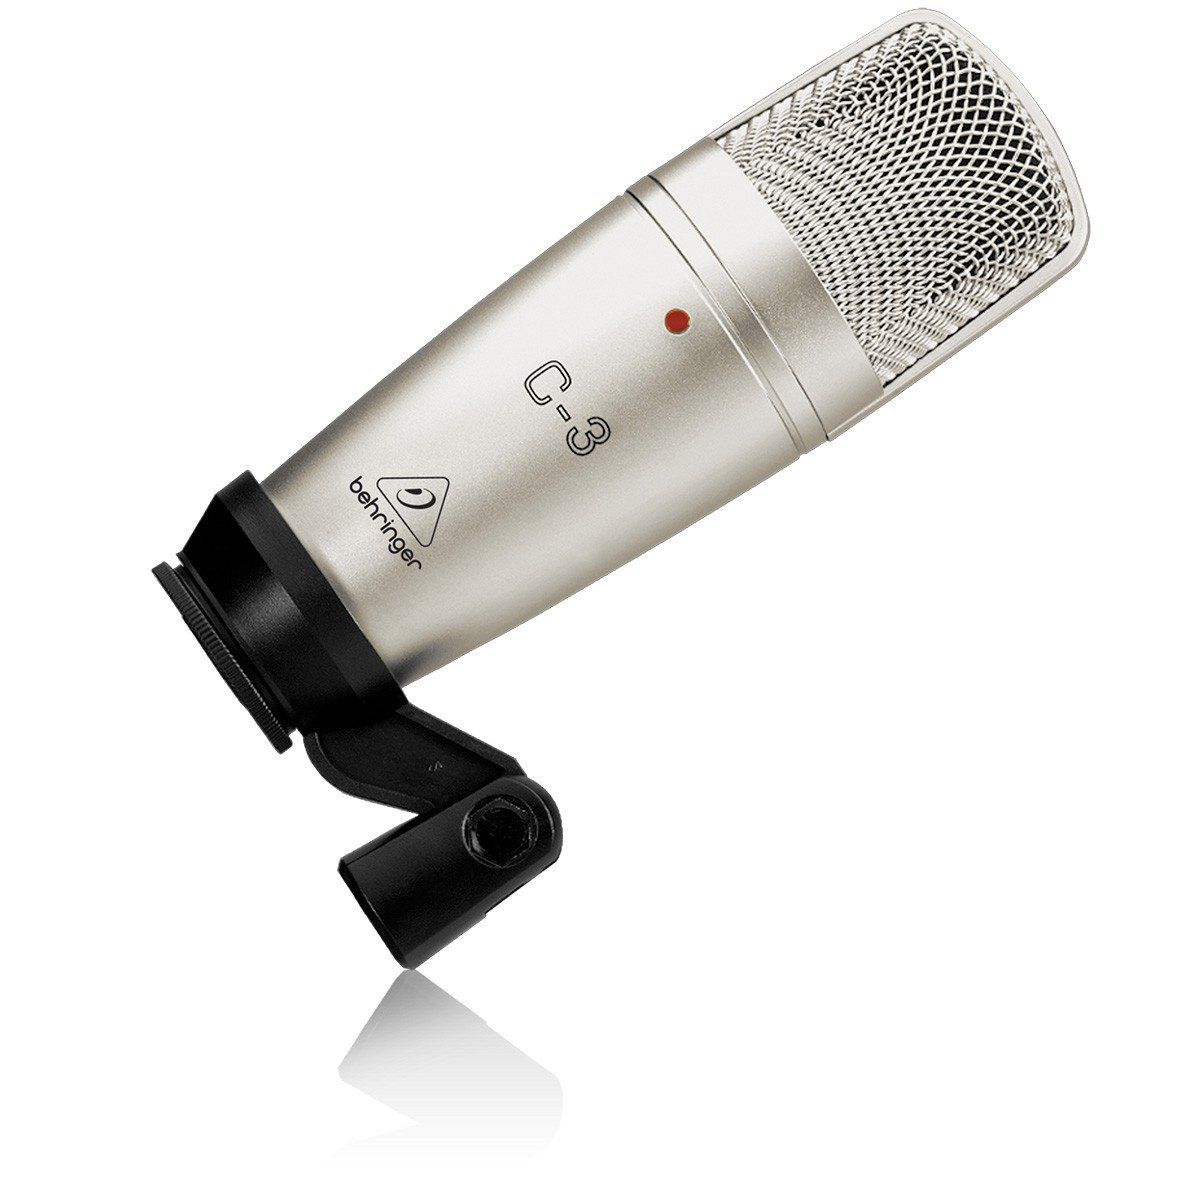 Behringer C3 Microfone Condensador Behringer C-3 Profissional para Gravações